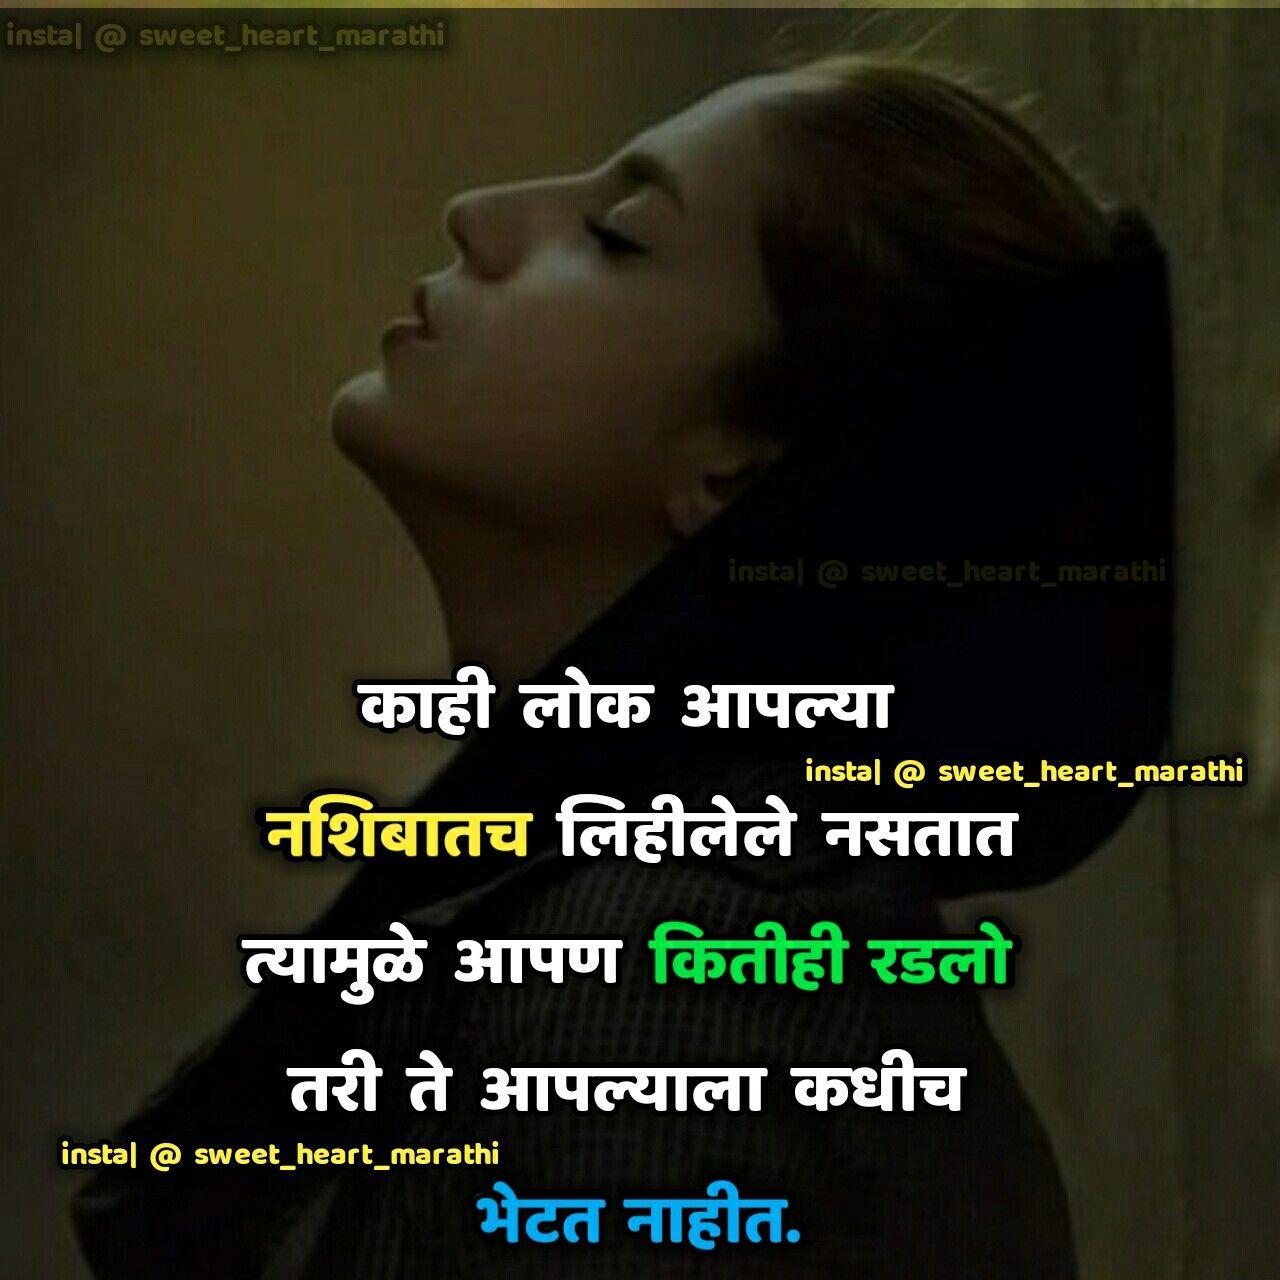 Right Na Friendship Quotes Marathi Love Quotes Marathi Quotes